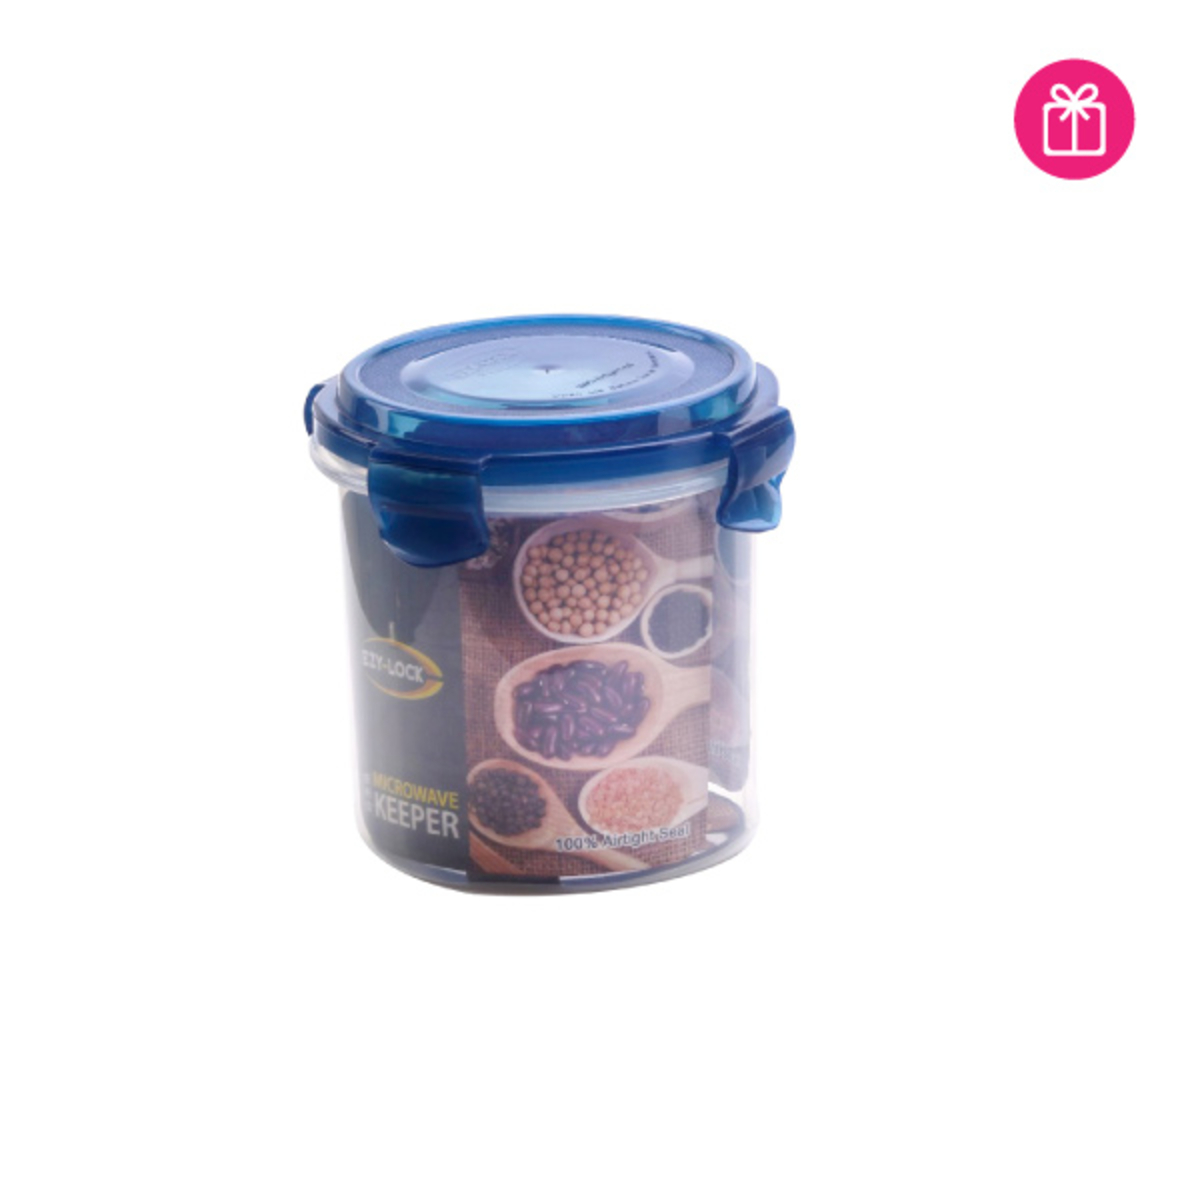 Otree Berry Nuts Set | Go Shop